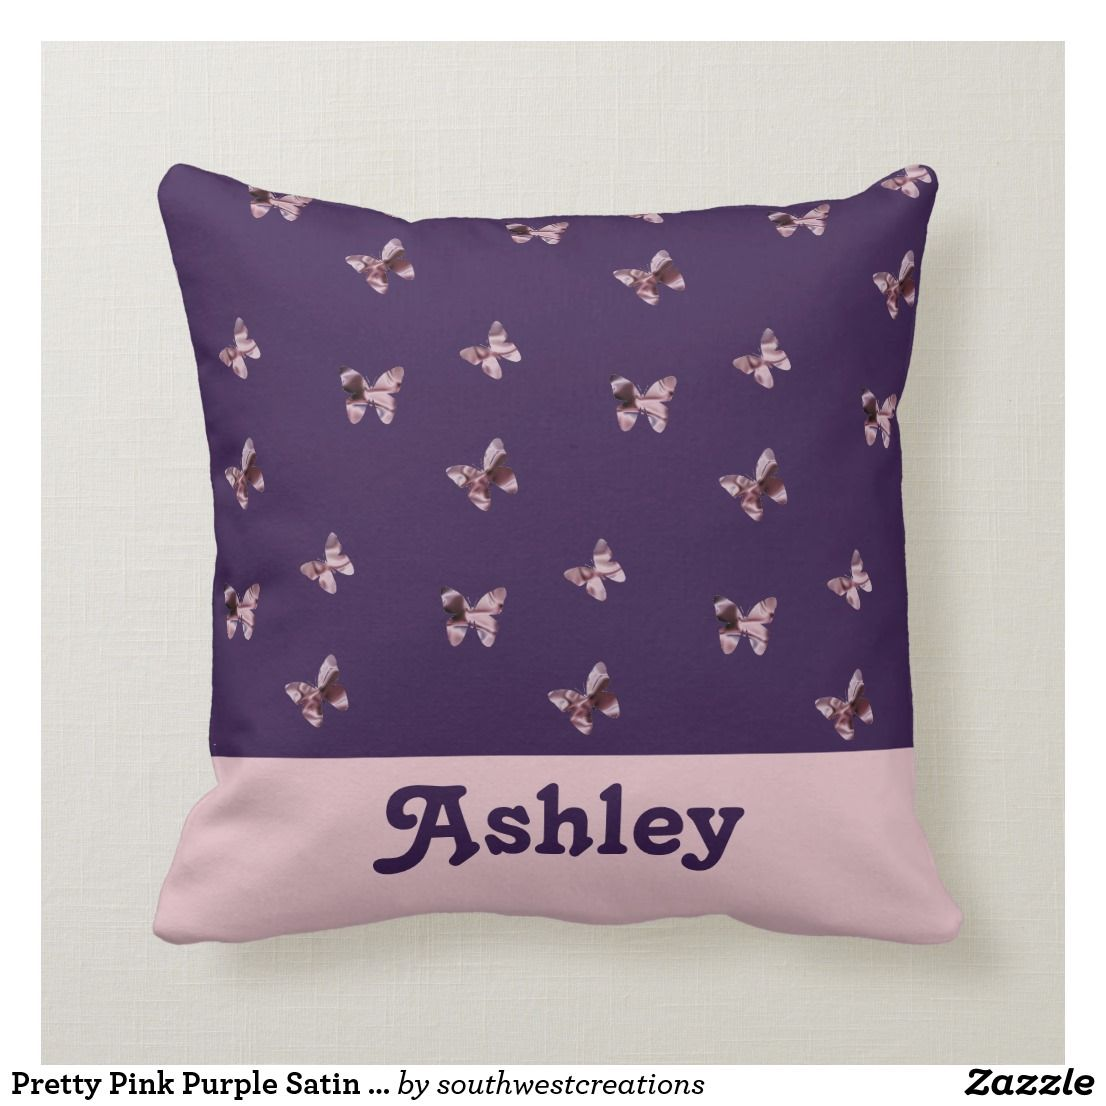 NEW Floral Butterflies Satin Fleece Childrens Blanket//Pillow Case Baby Gift